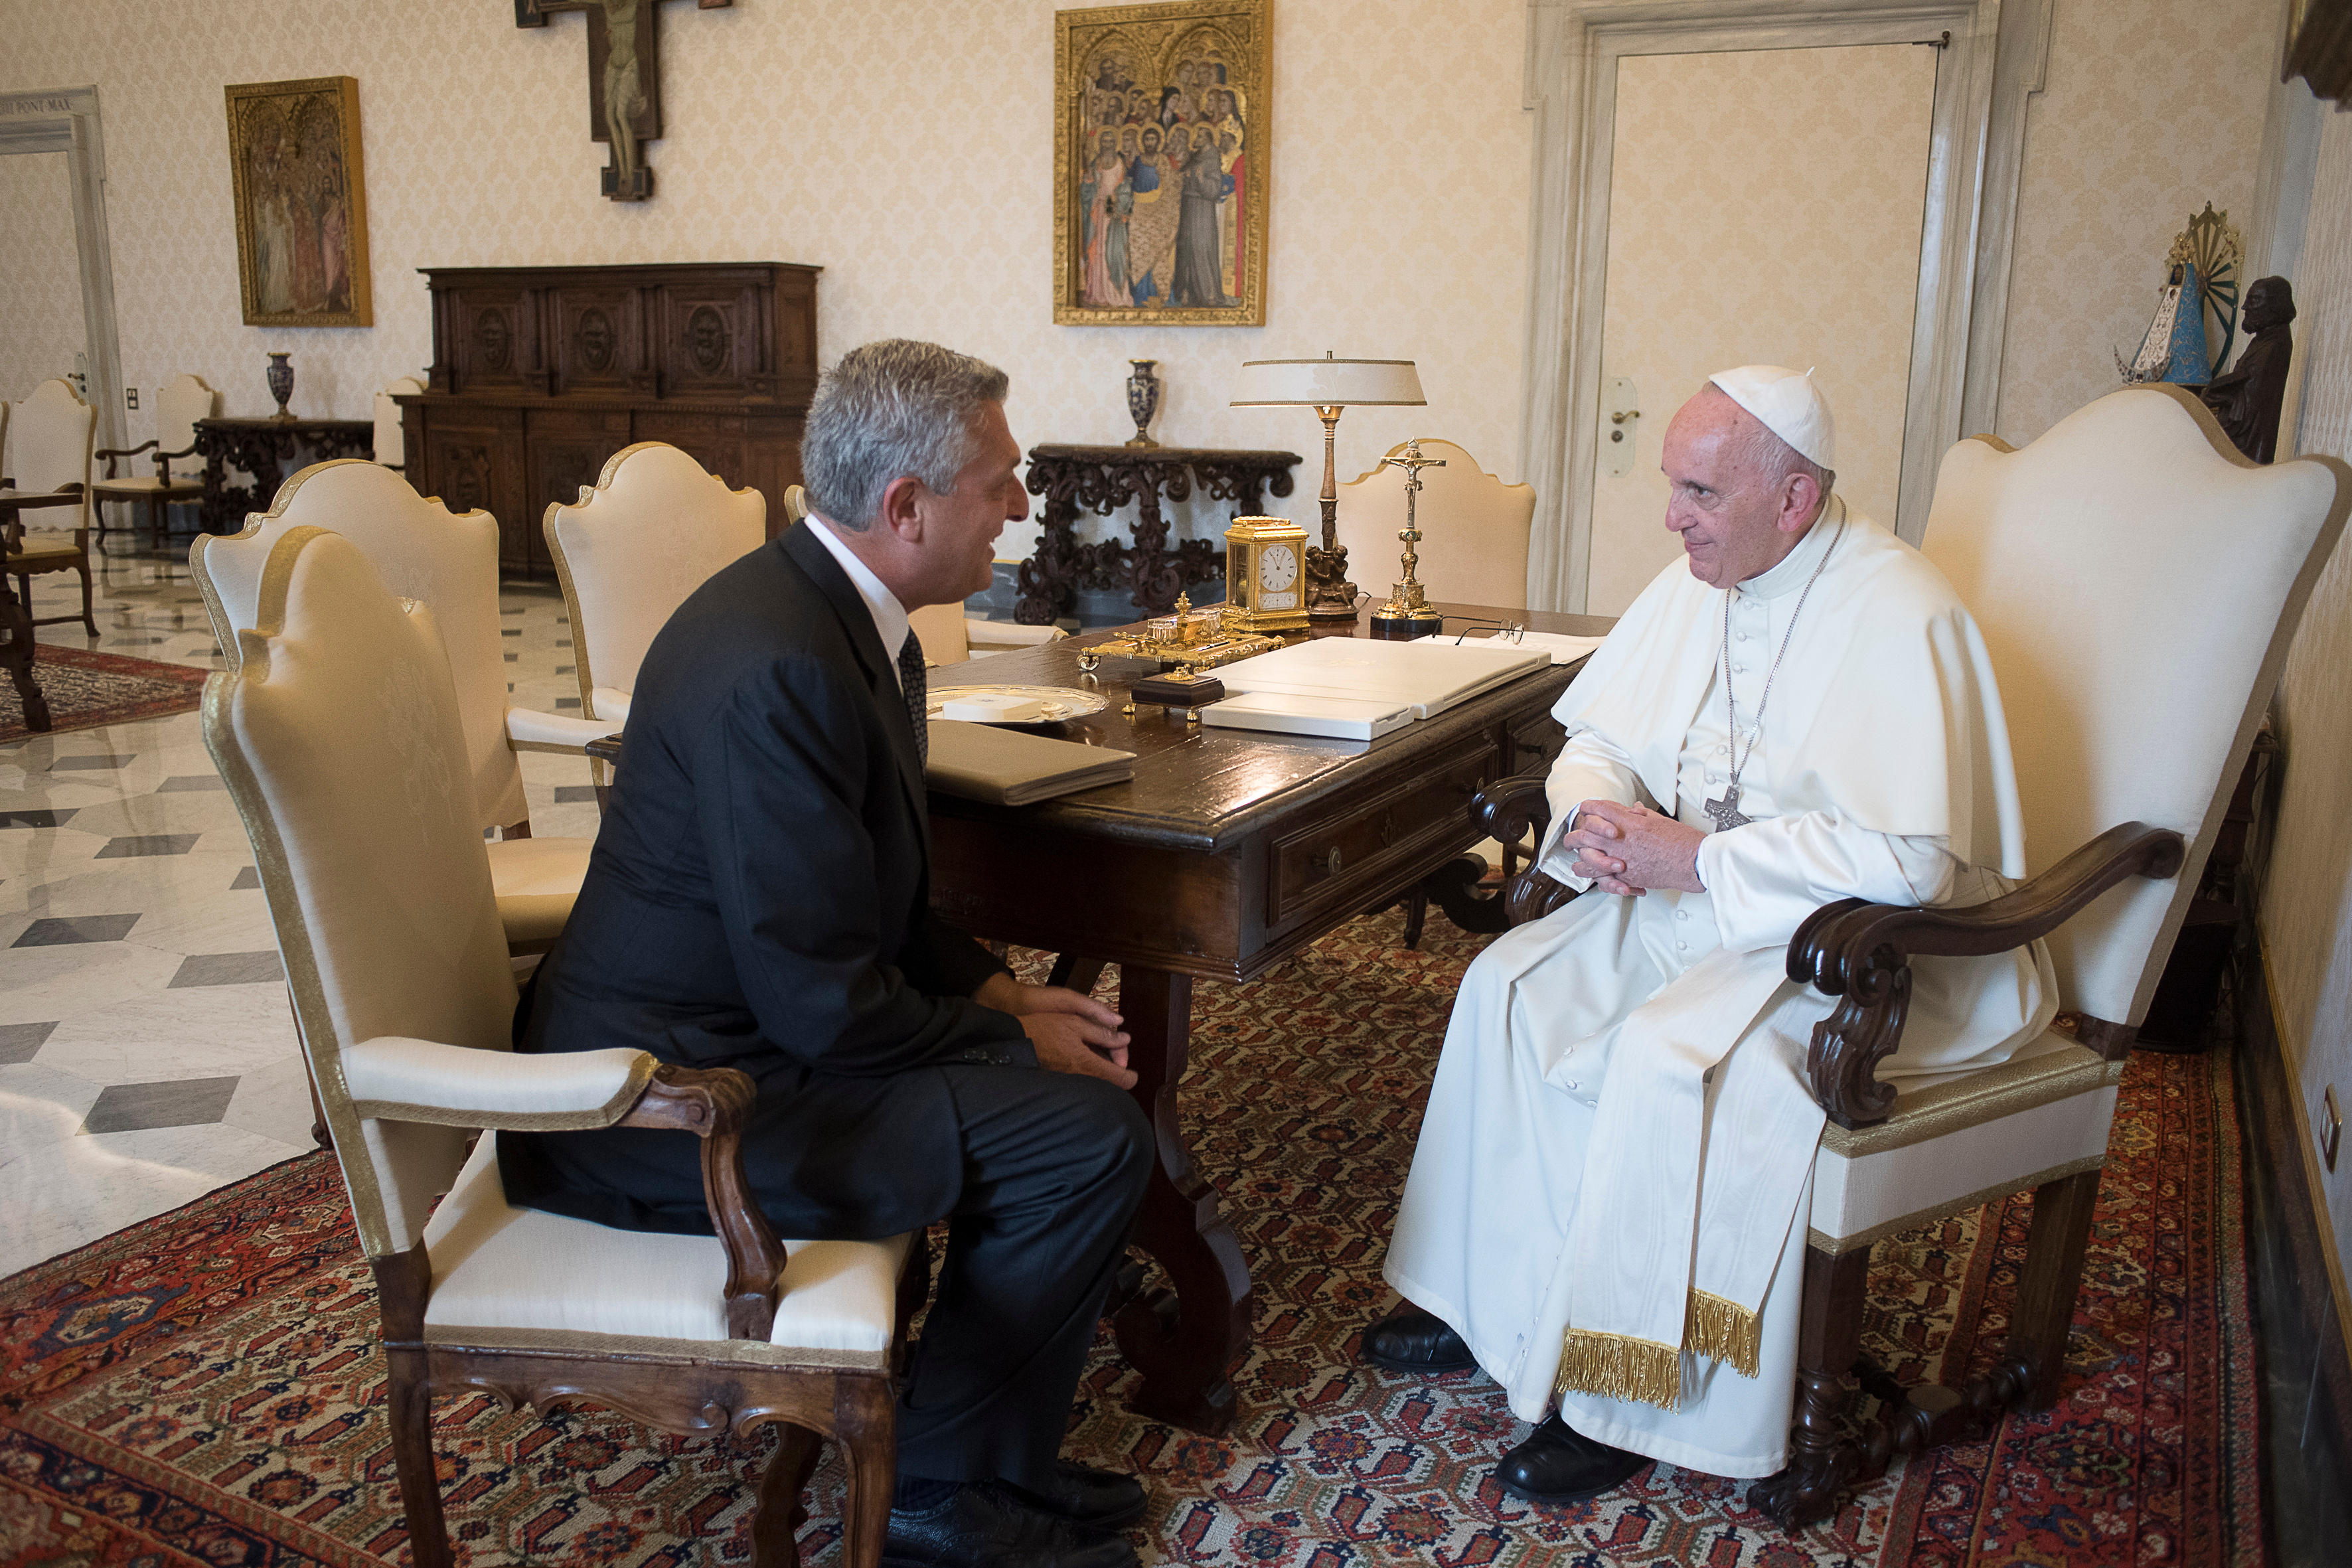 Filippo Grandi reçu par le pape François, 15 sept. 2016 © L'Osservatore Romano